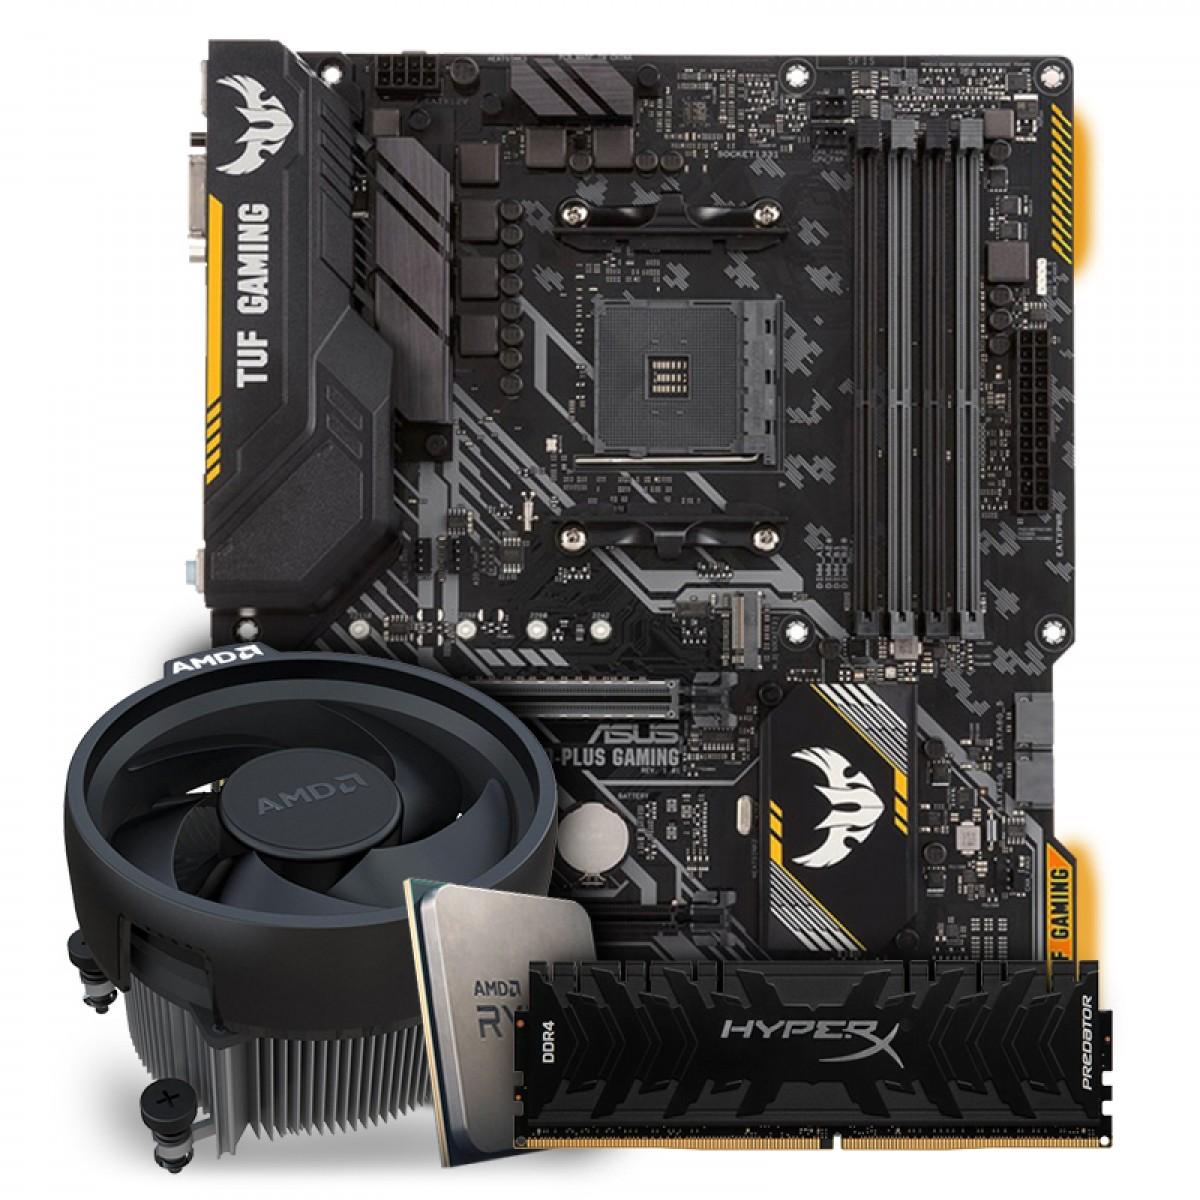 Kit Upgrade Placa Mãe Asus TUF B450-Plus Gaming, AMD AM4 + Processador AMD Ryzen 5 3600 3.6GHz + Memória DDR4 Kingston Hyperx Predator 8GB 3000MHZ